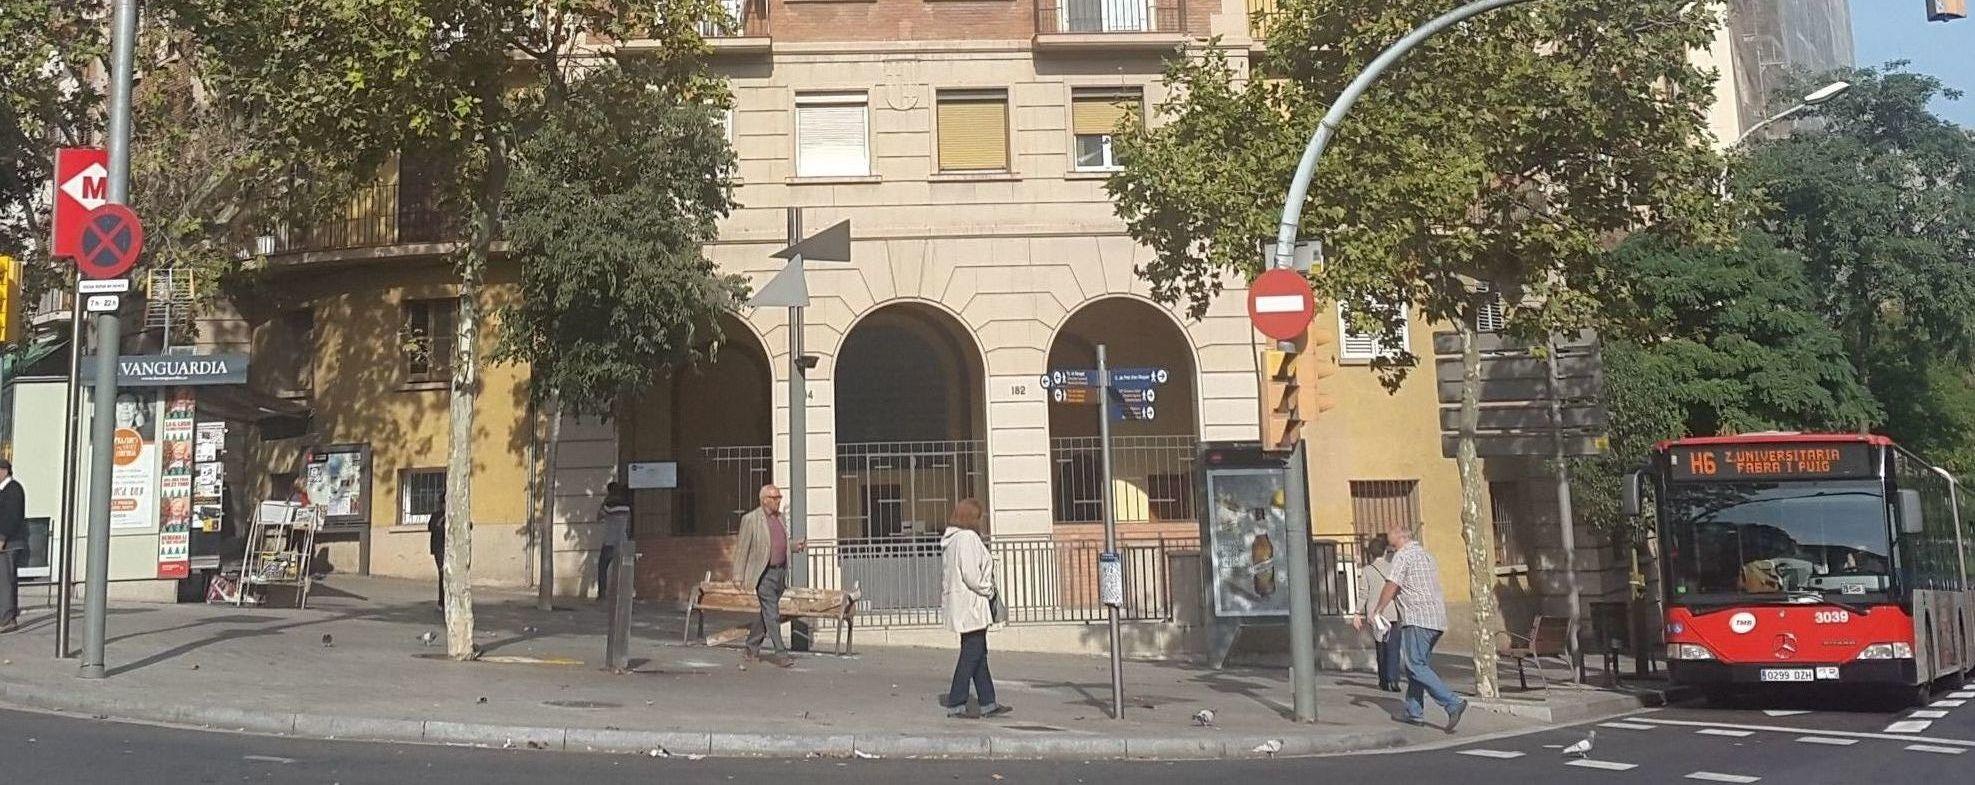 Foto 27 de Despacho de abogados multidisciplinar en Barcelona en  | ASSISTLEGAL                                                abogados Maragall